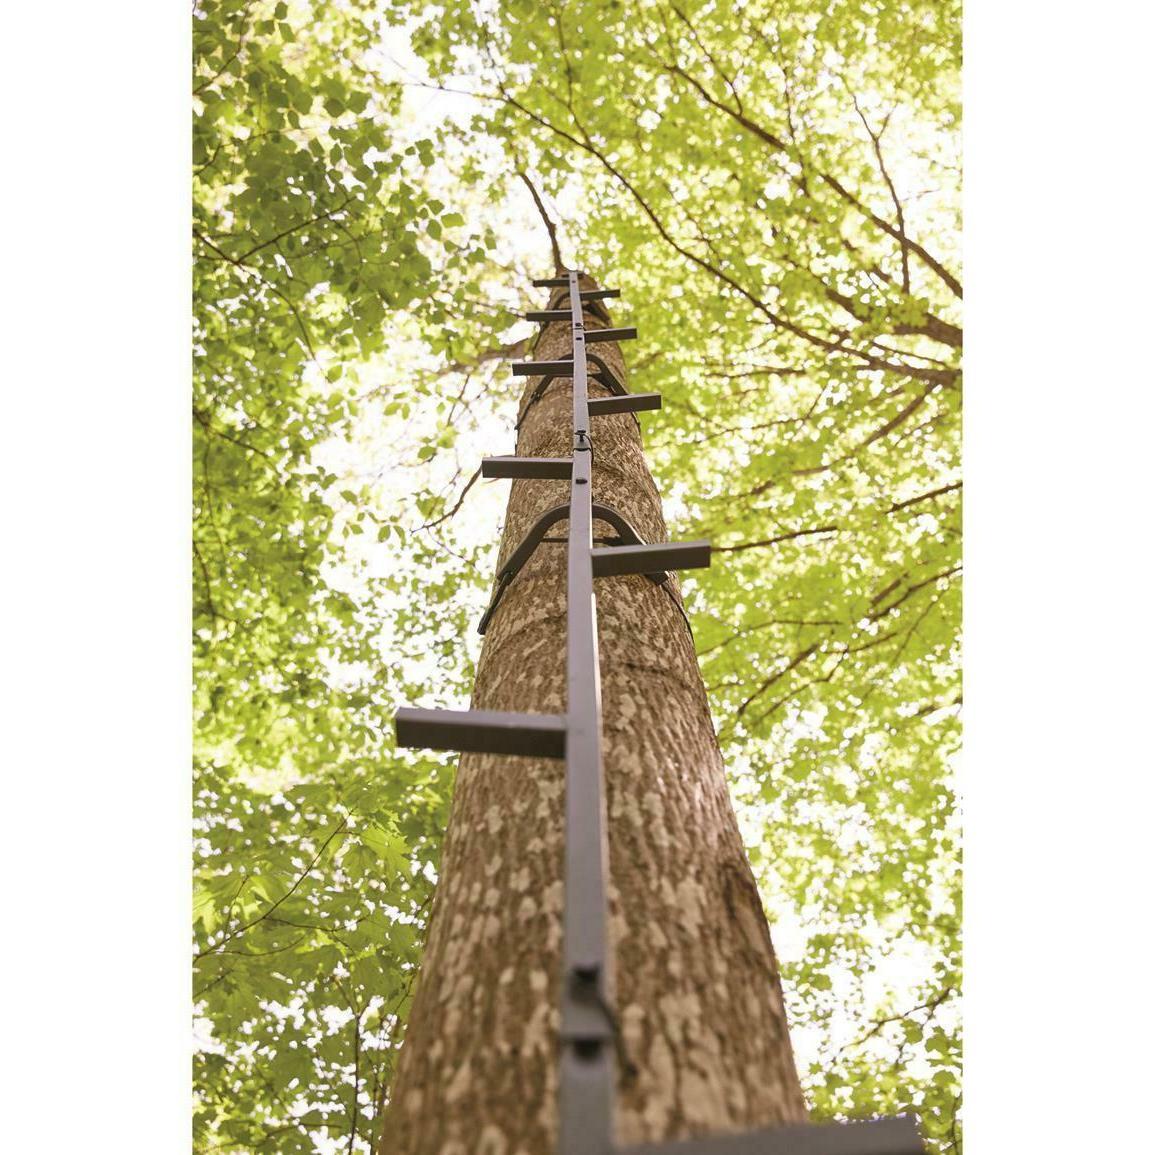 Guide Climbing Sticks Sturdy Steps All Steel